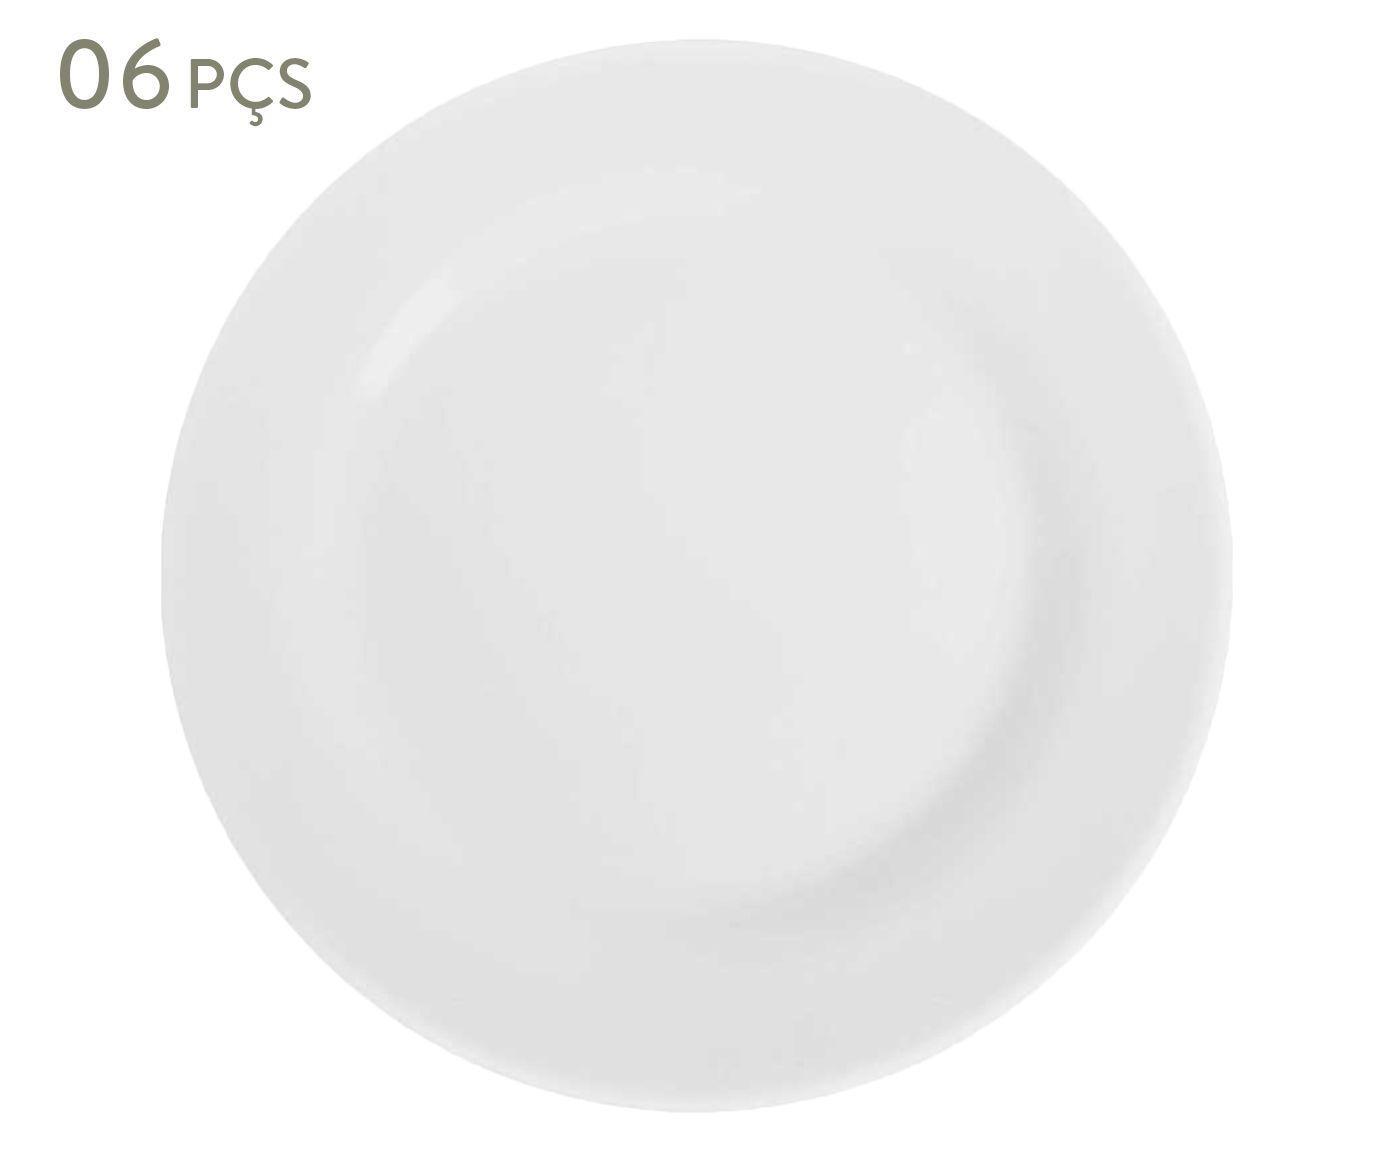 Conjunto de pratos rasos brief 24 cm - duralex | Westwing.com.br